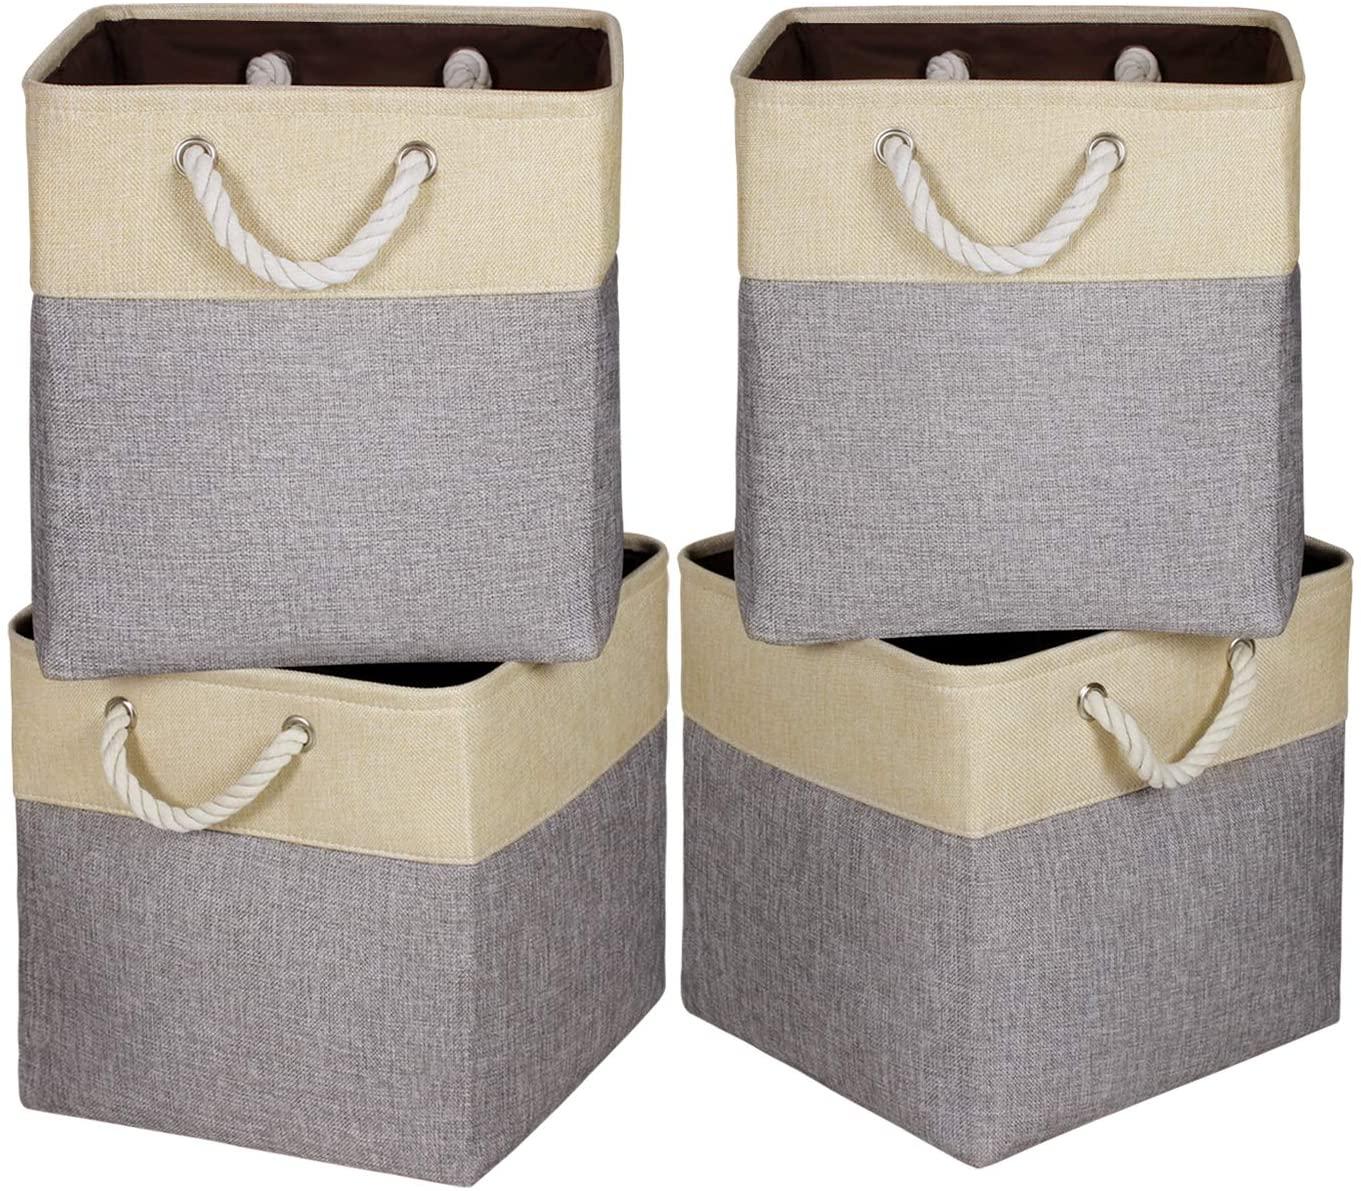 Univivi Foldable Fabric Storage Bins [Set of 4] Large Foldable Canvas Fabric with Handles Fabric Storage Baskets for Organizing Shelf Nursery Home Closet (Gray - 13